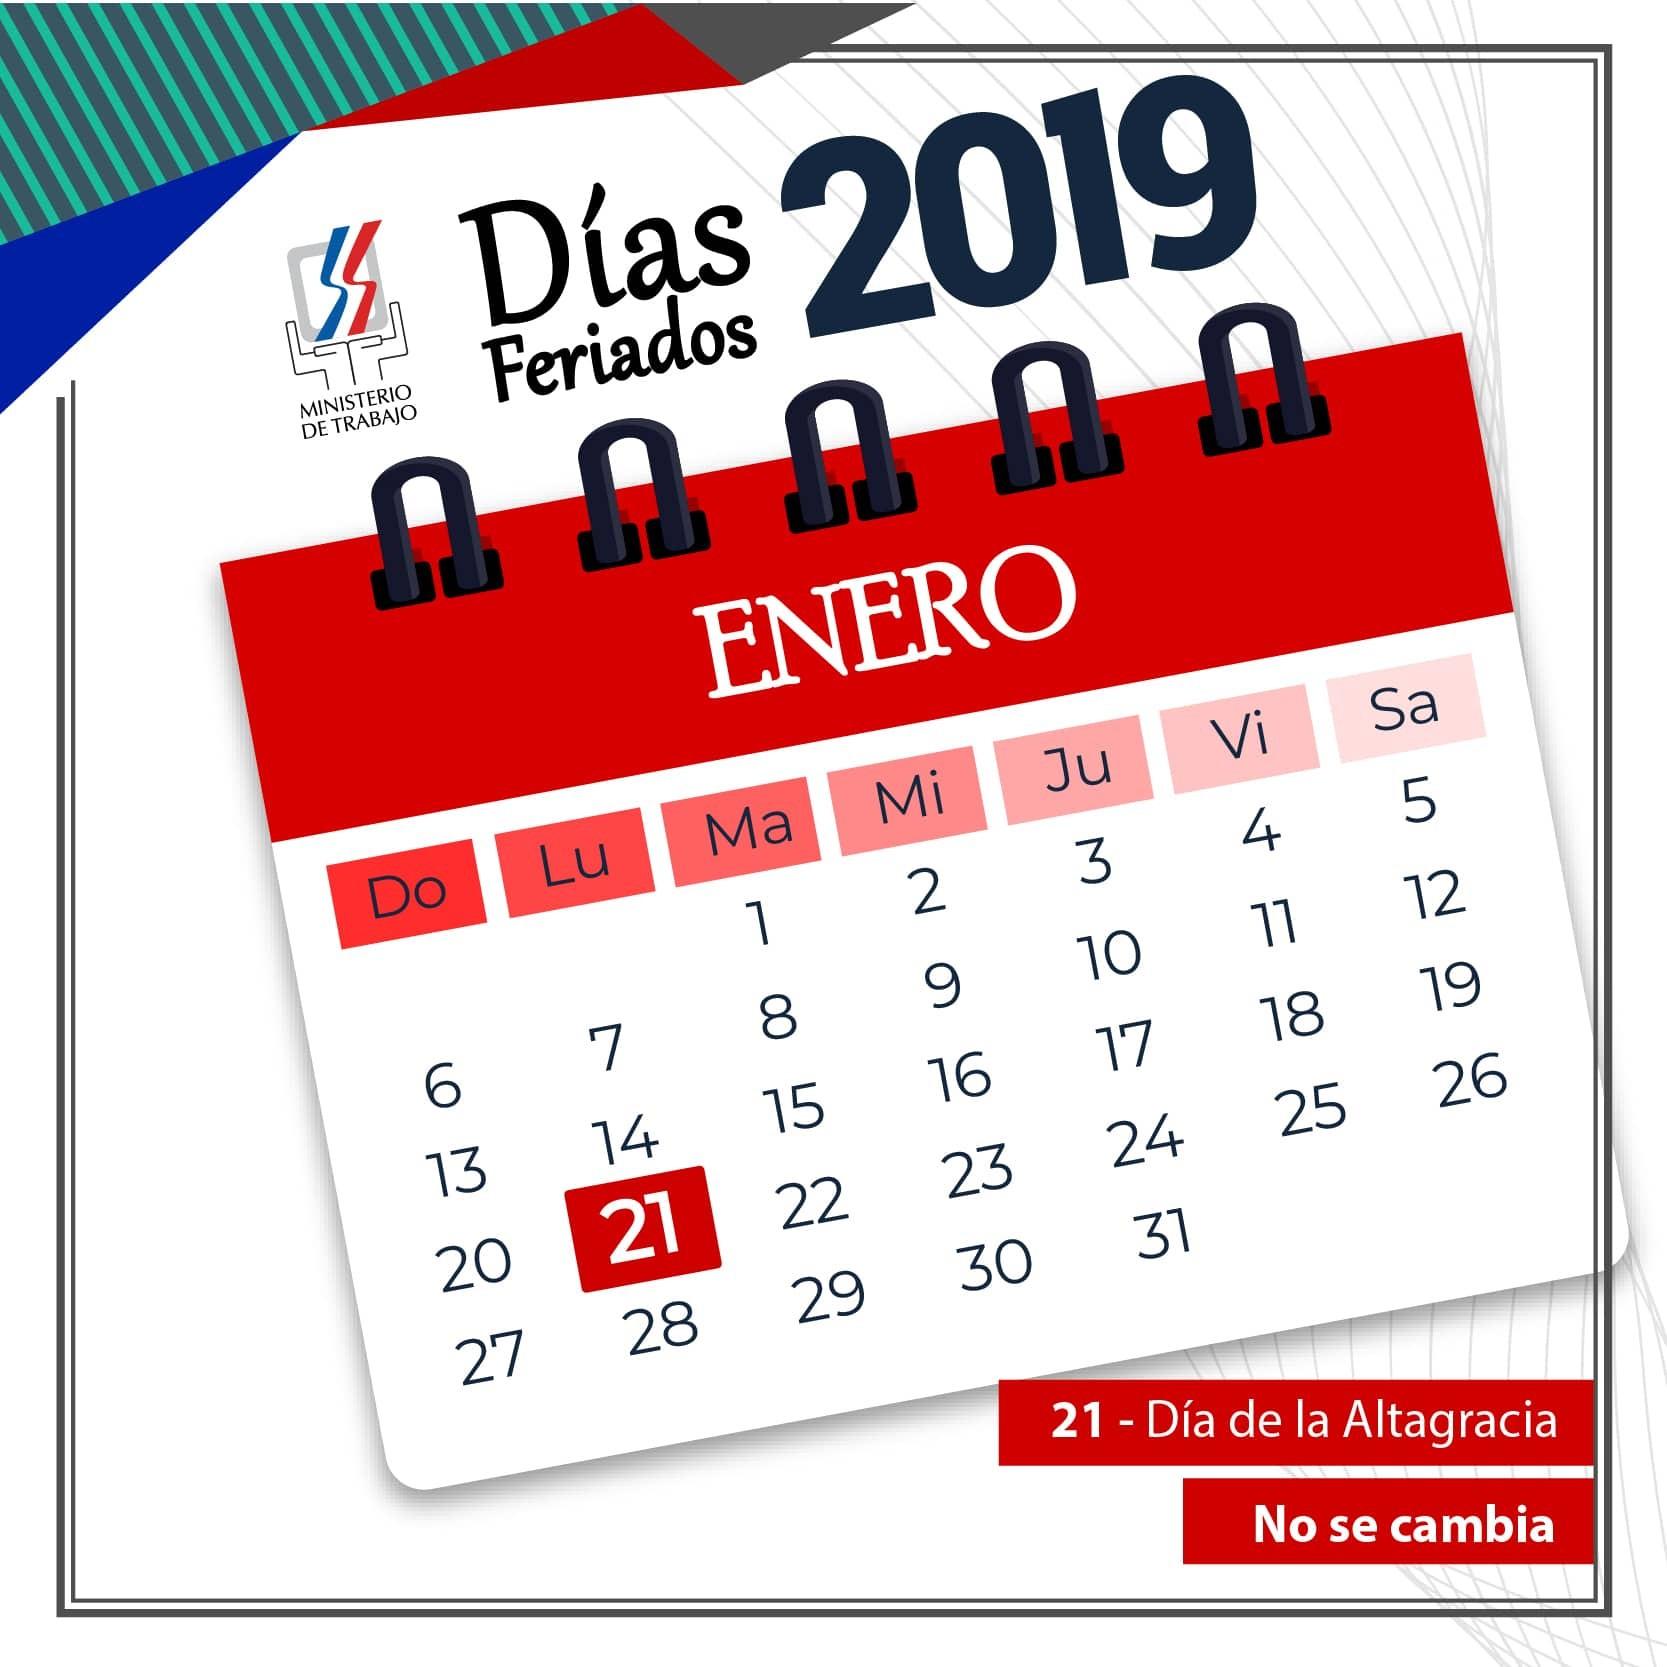 "Ministerio de Trabajo reitera feriado Da de la Altagracia ""no se cambia"""